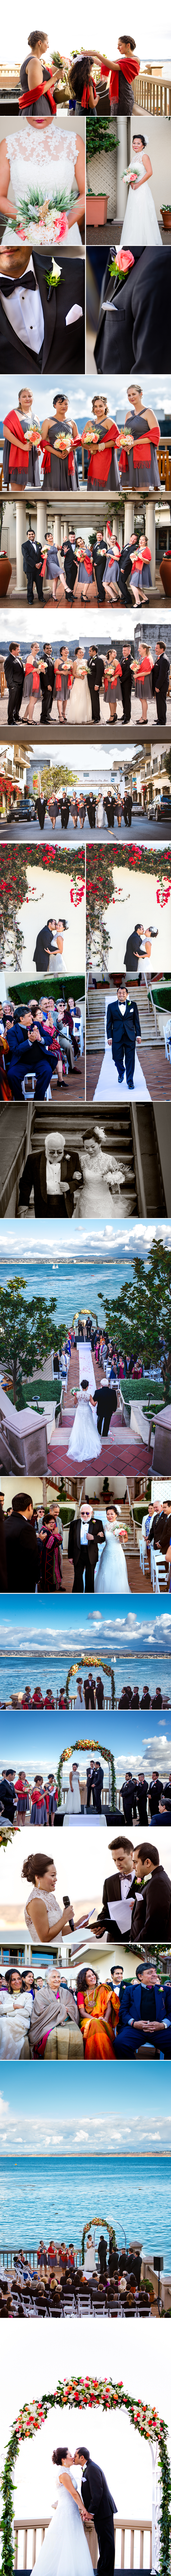 Monterey Indian fusion wedding